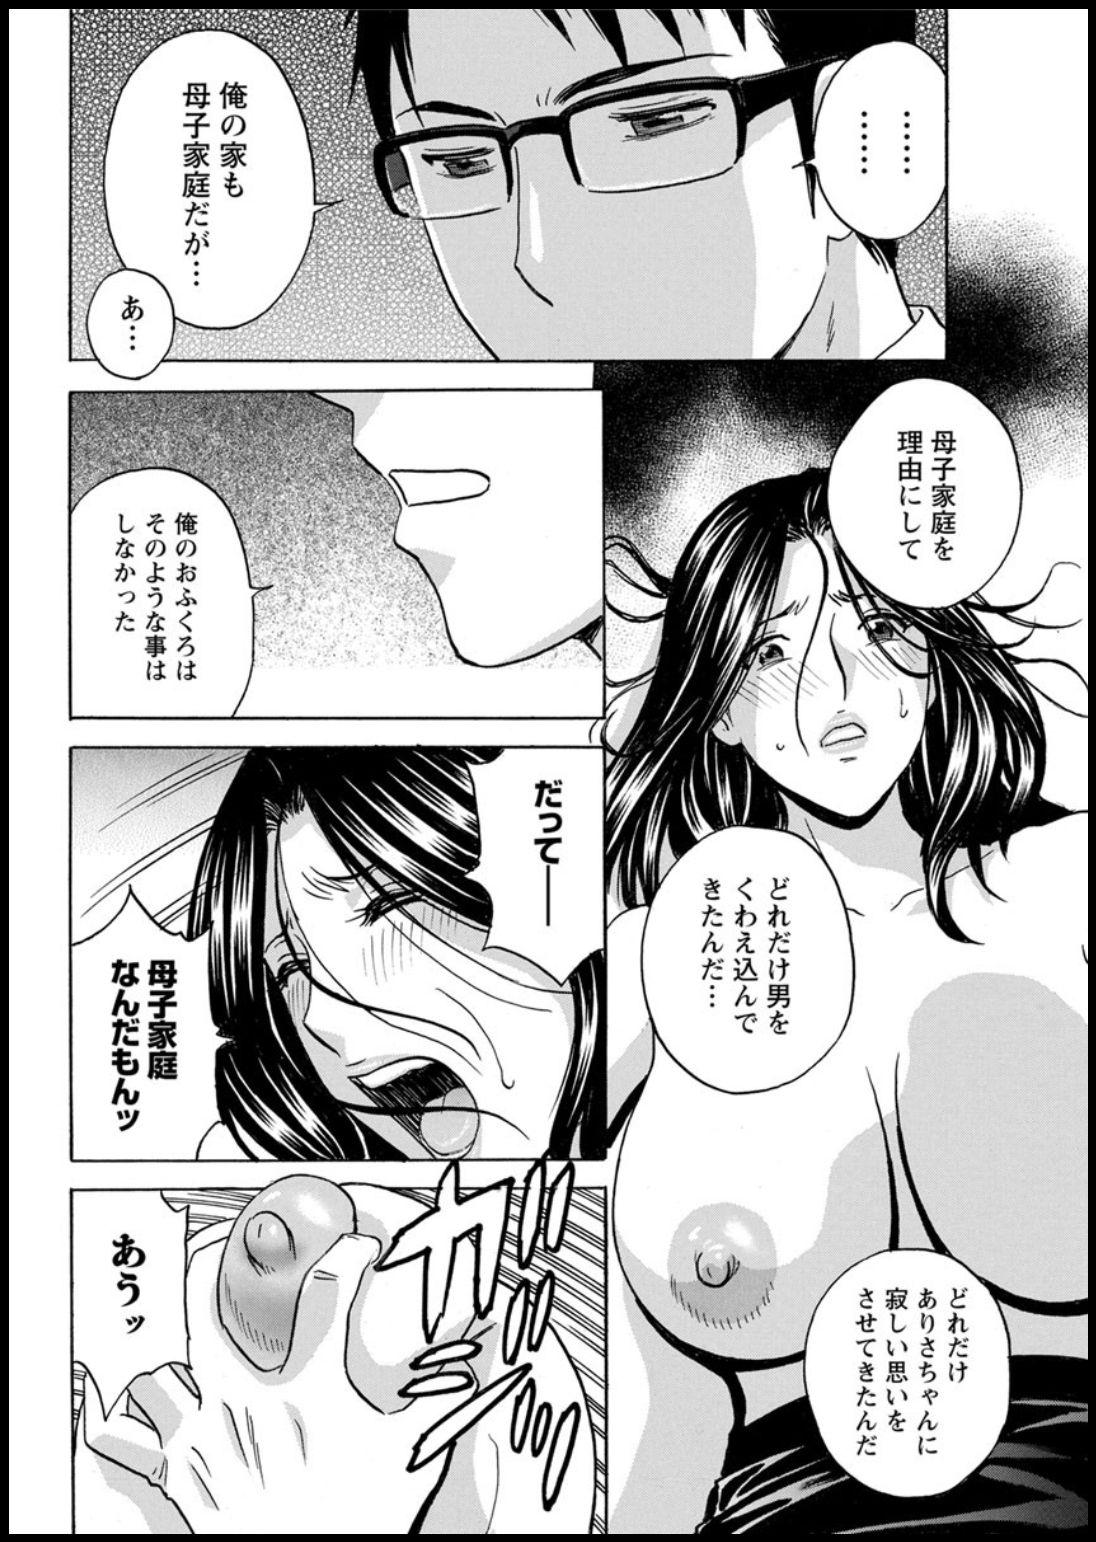 [Hidemaru] Yurase Bikyonyuu! Hataraku J-Cup Ch. 1-5 [Digital] 47